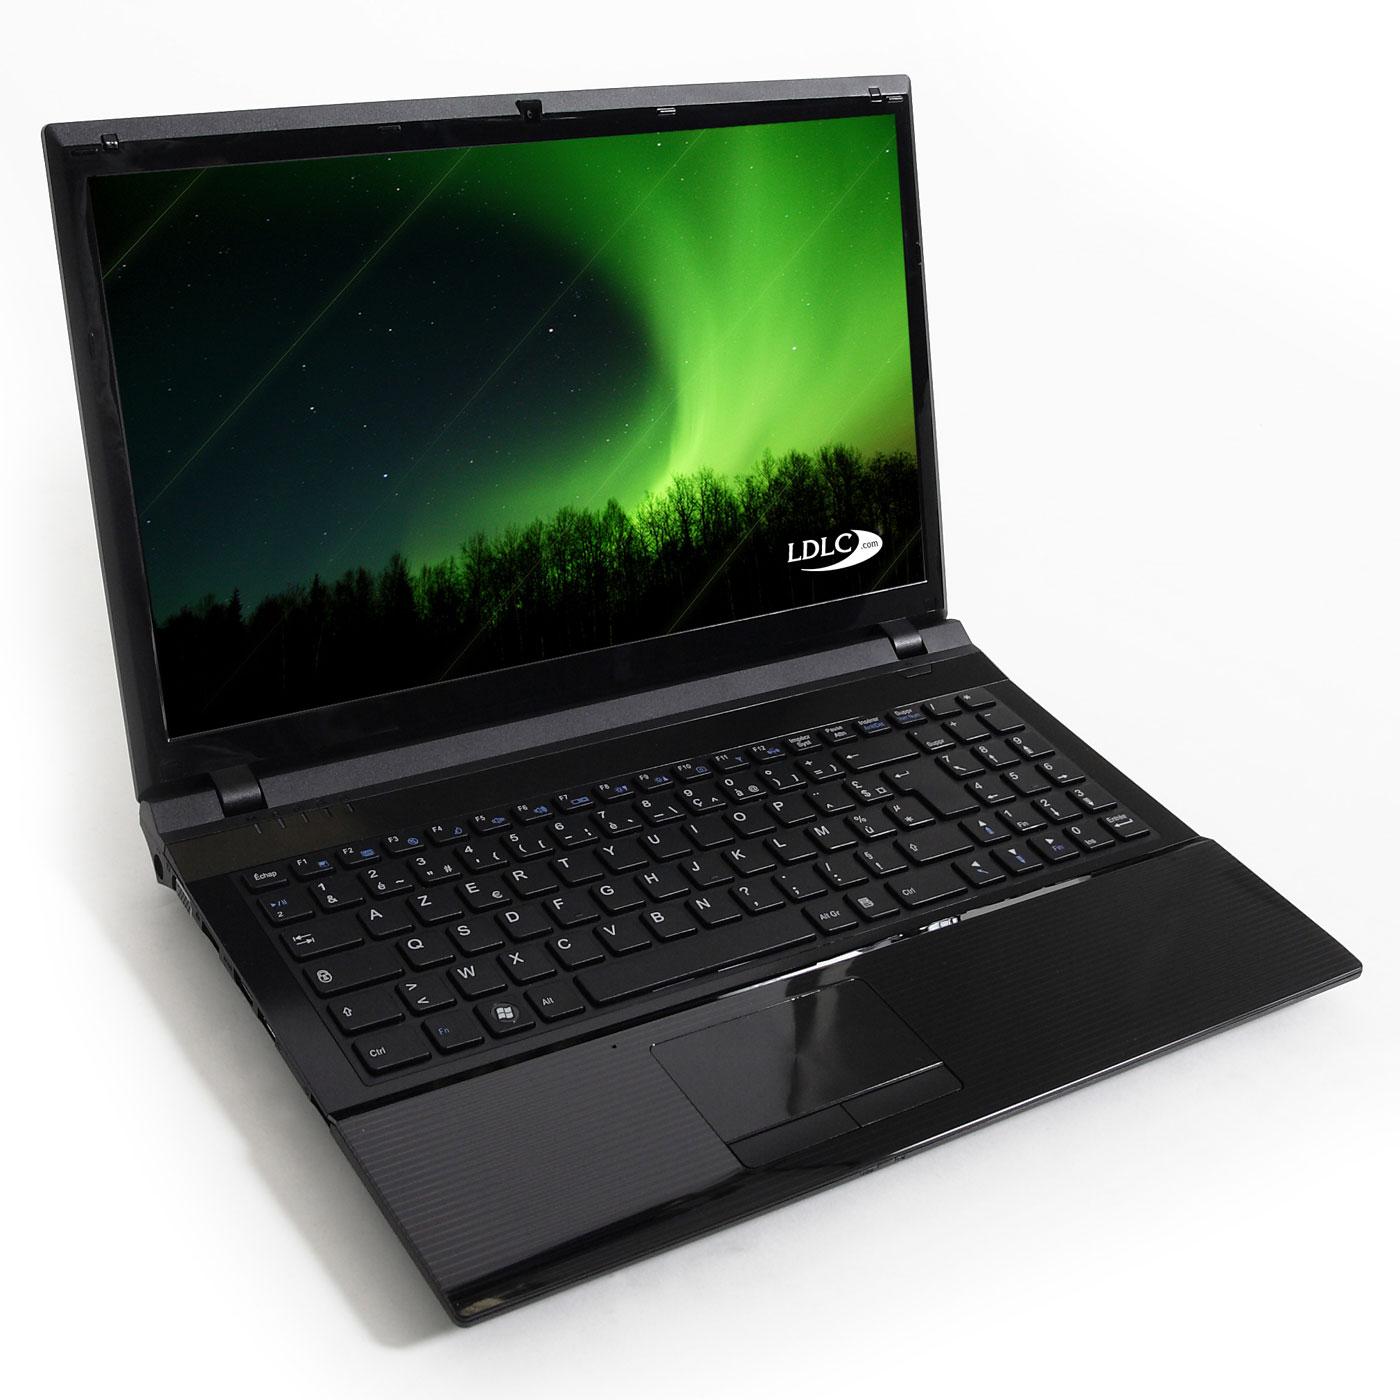 "PC portable LDLC Aurore BB1-i5-4-H5 Intel Core i5-2430M 4 Go 500 Go 15.6"" LED Graveur DVD Wi-Fi N/Bluetooth Webcam (sans OS)"